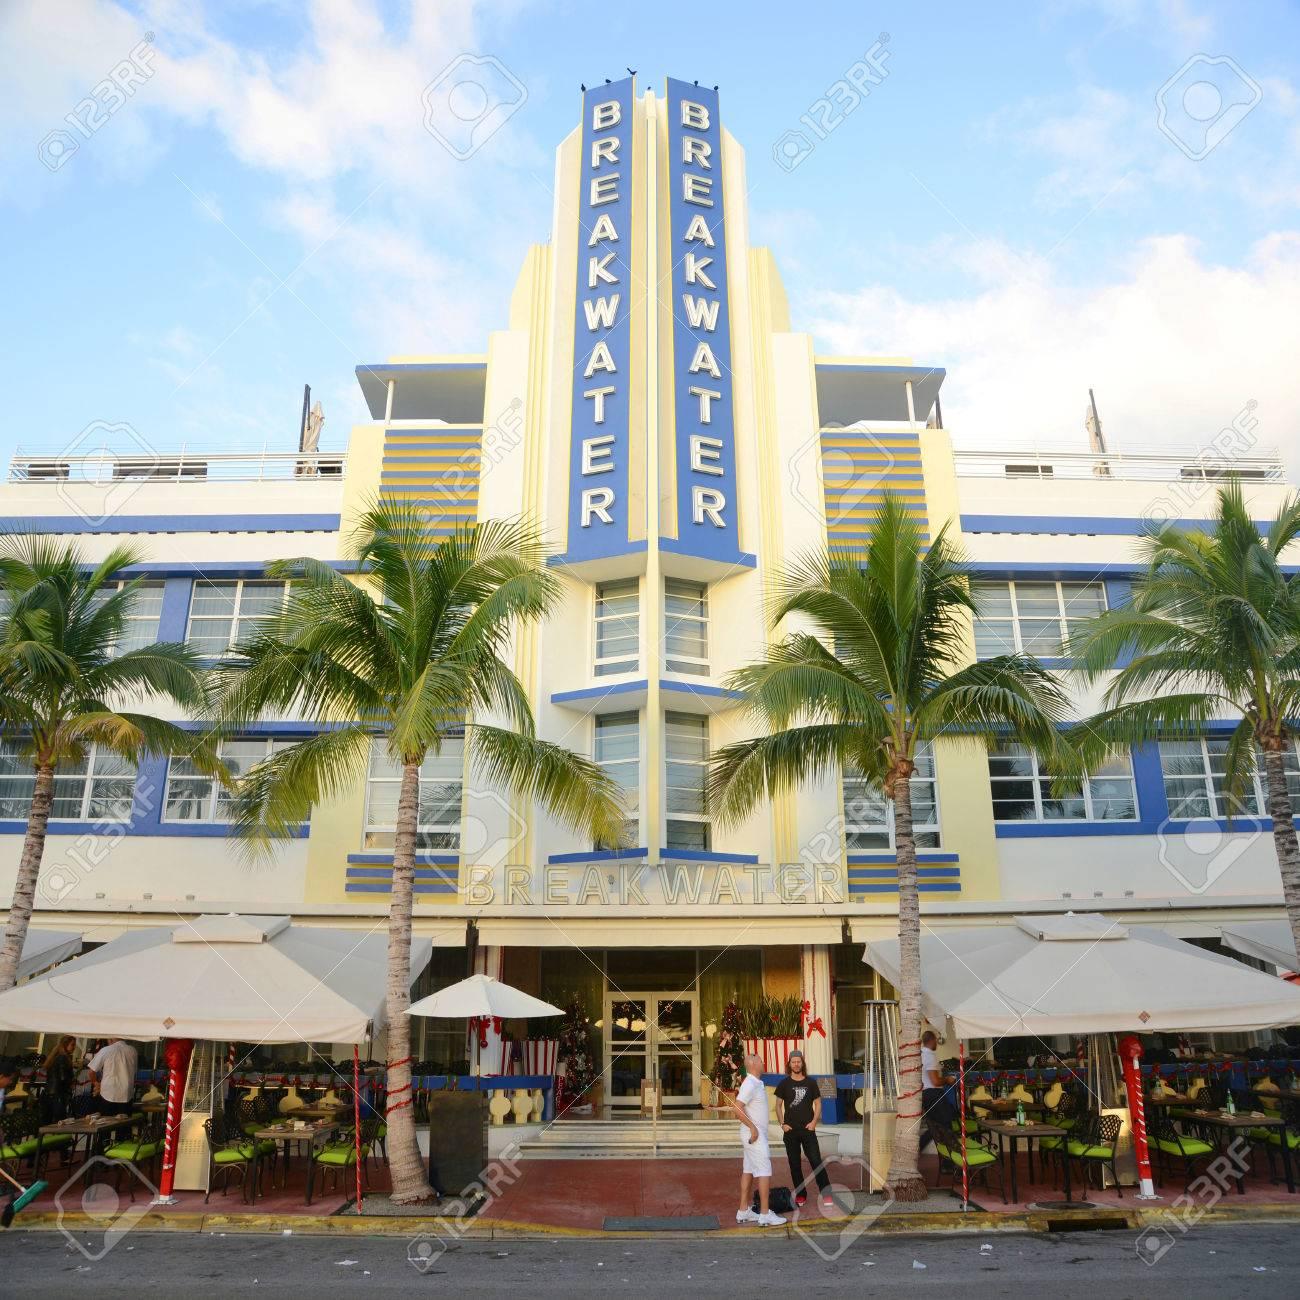 Breakwater Building With Art Deco Style In Miami Beach, Miami ...